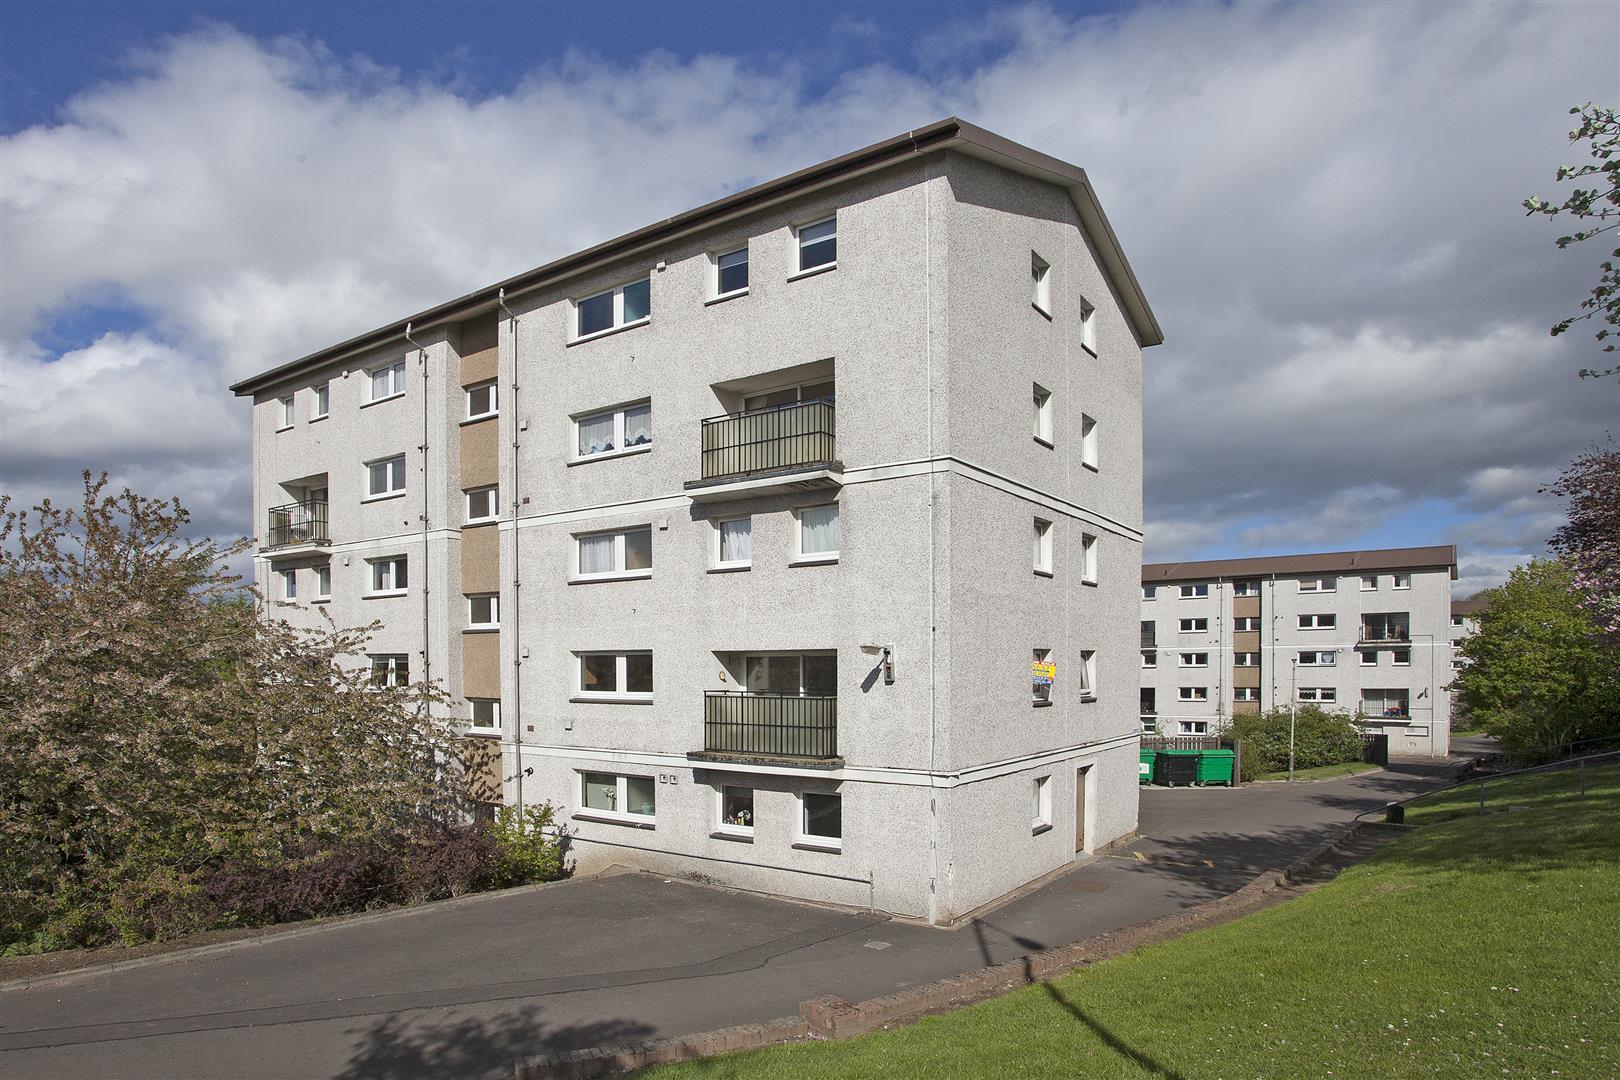 144, Strathtay Road, Perth, Perthshire, PH1 2NB, UK